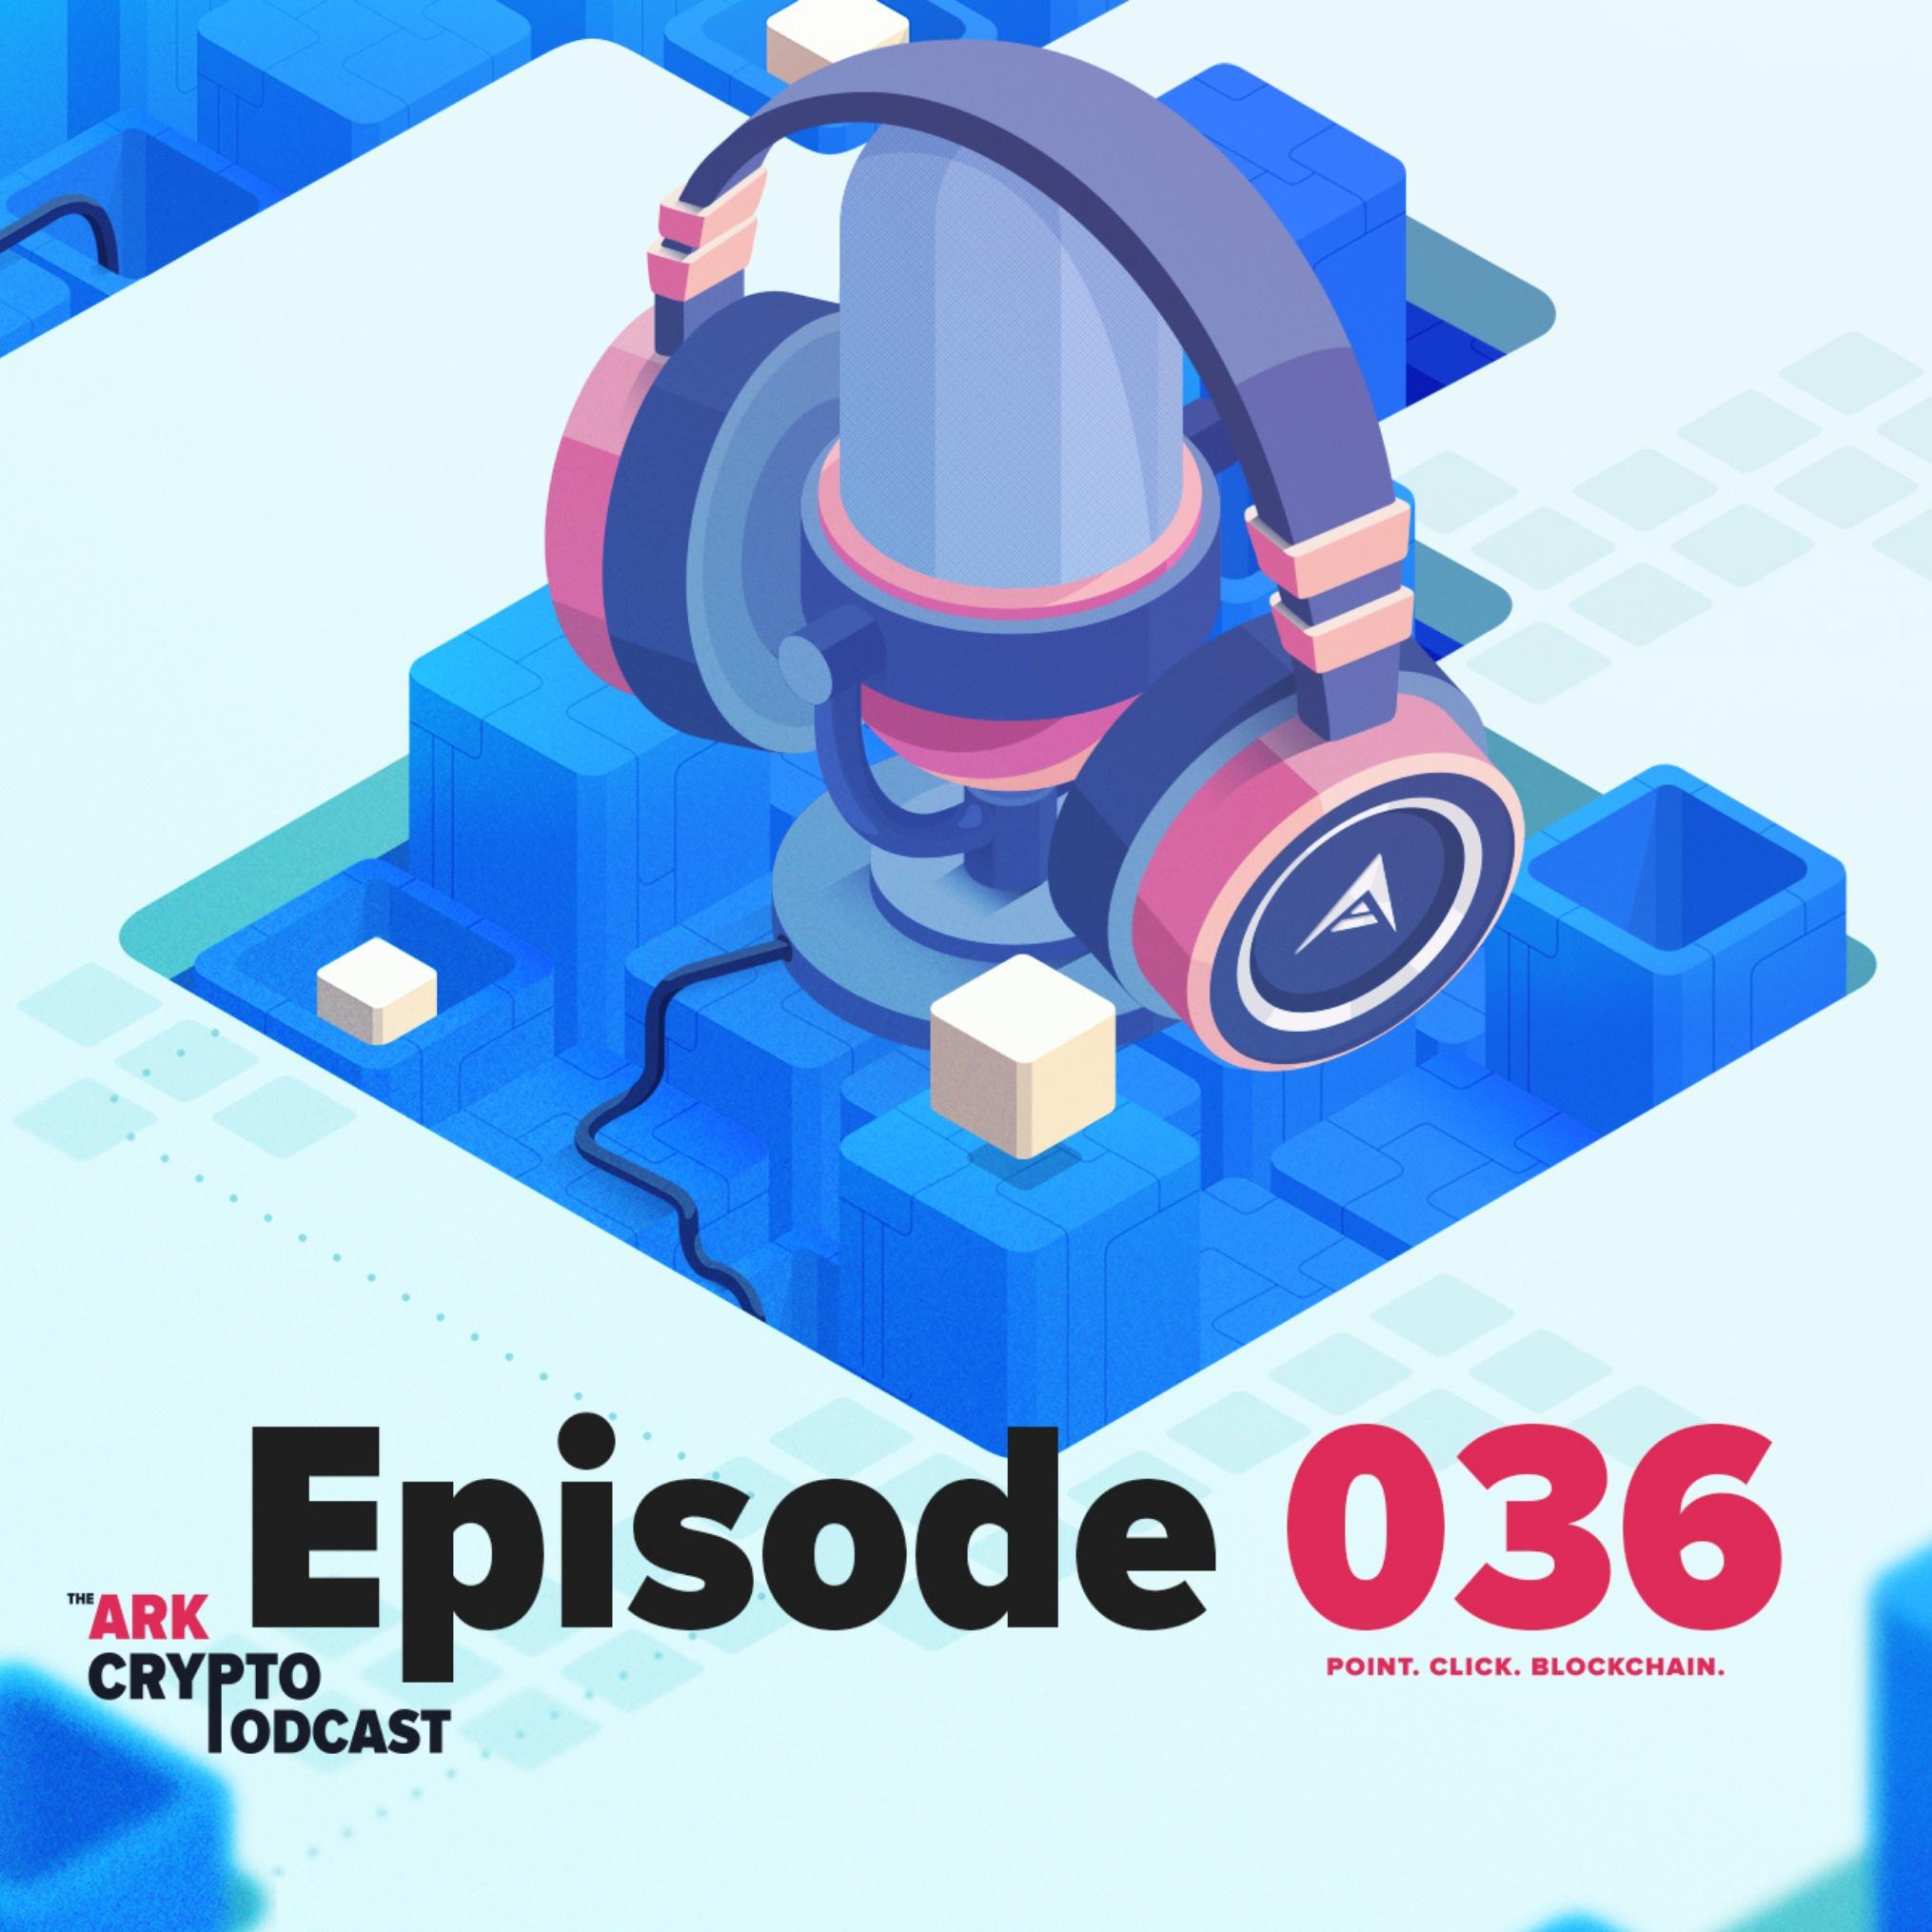 ARK Crypto Podcast #036 - ARK Spend.com App Integration and Community Questions